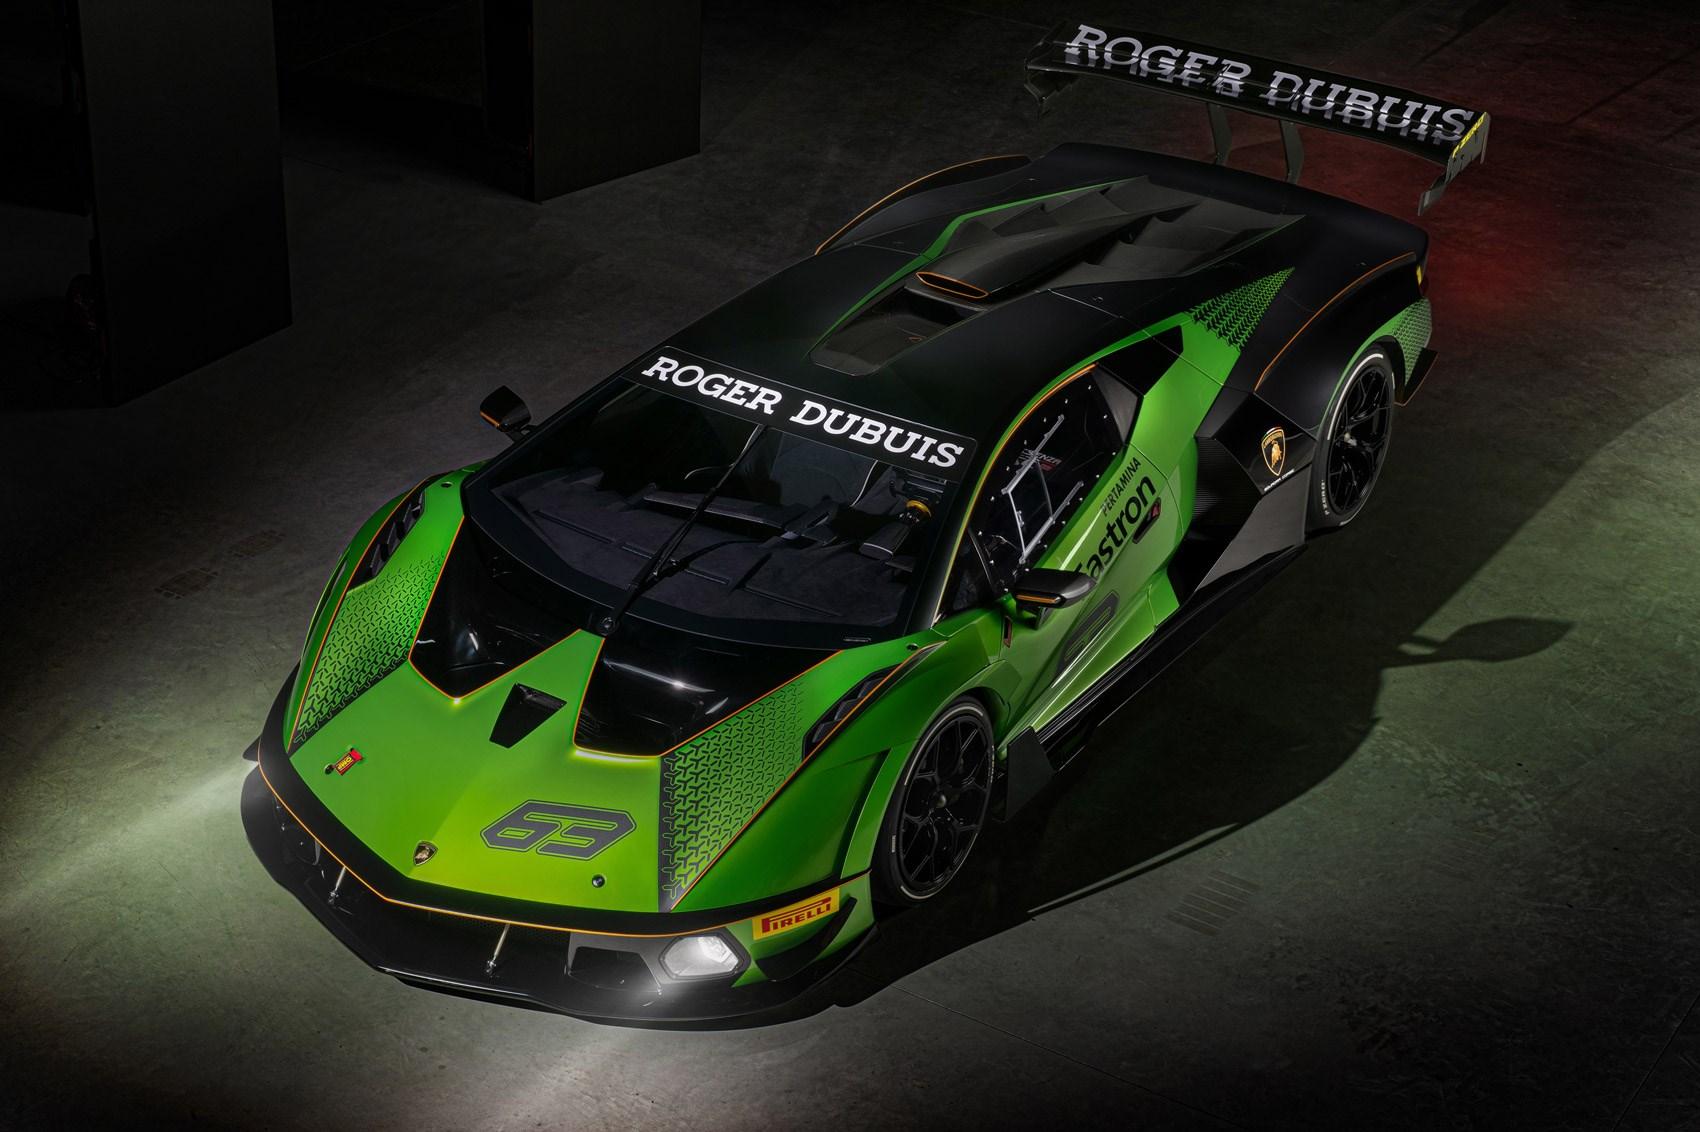 Squadra Corse builds a hypercar